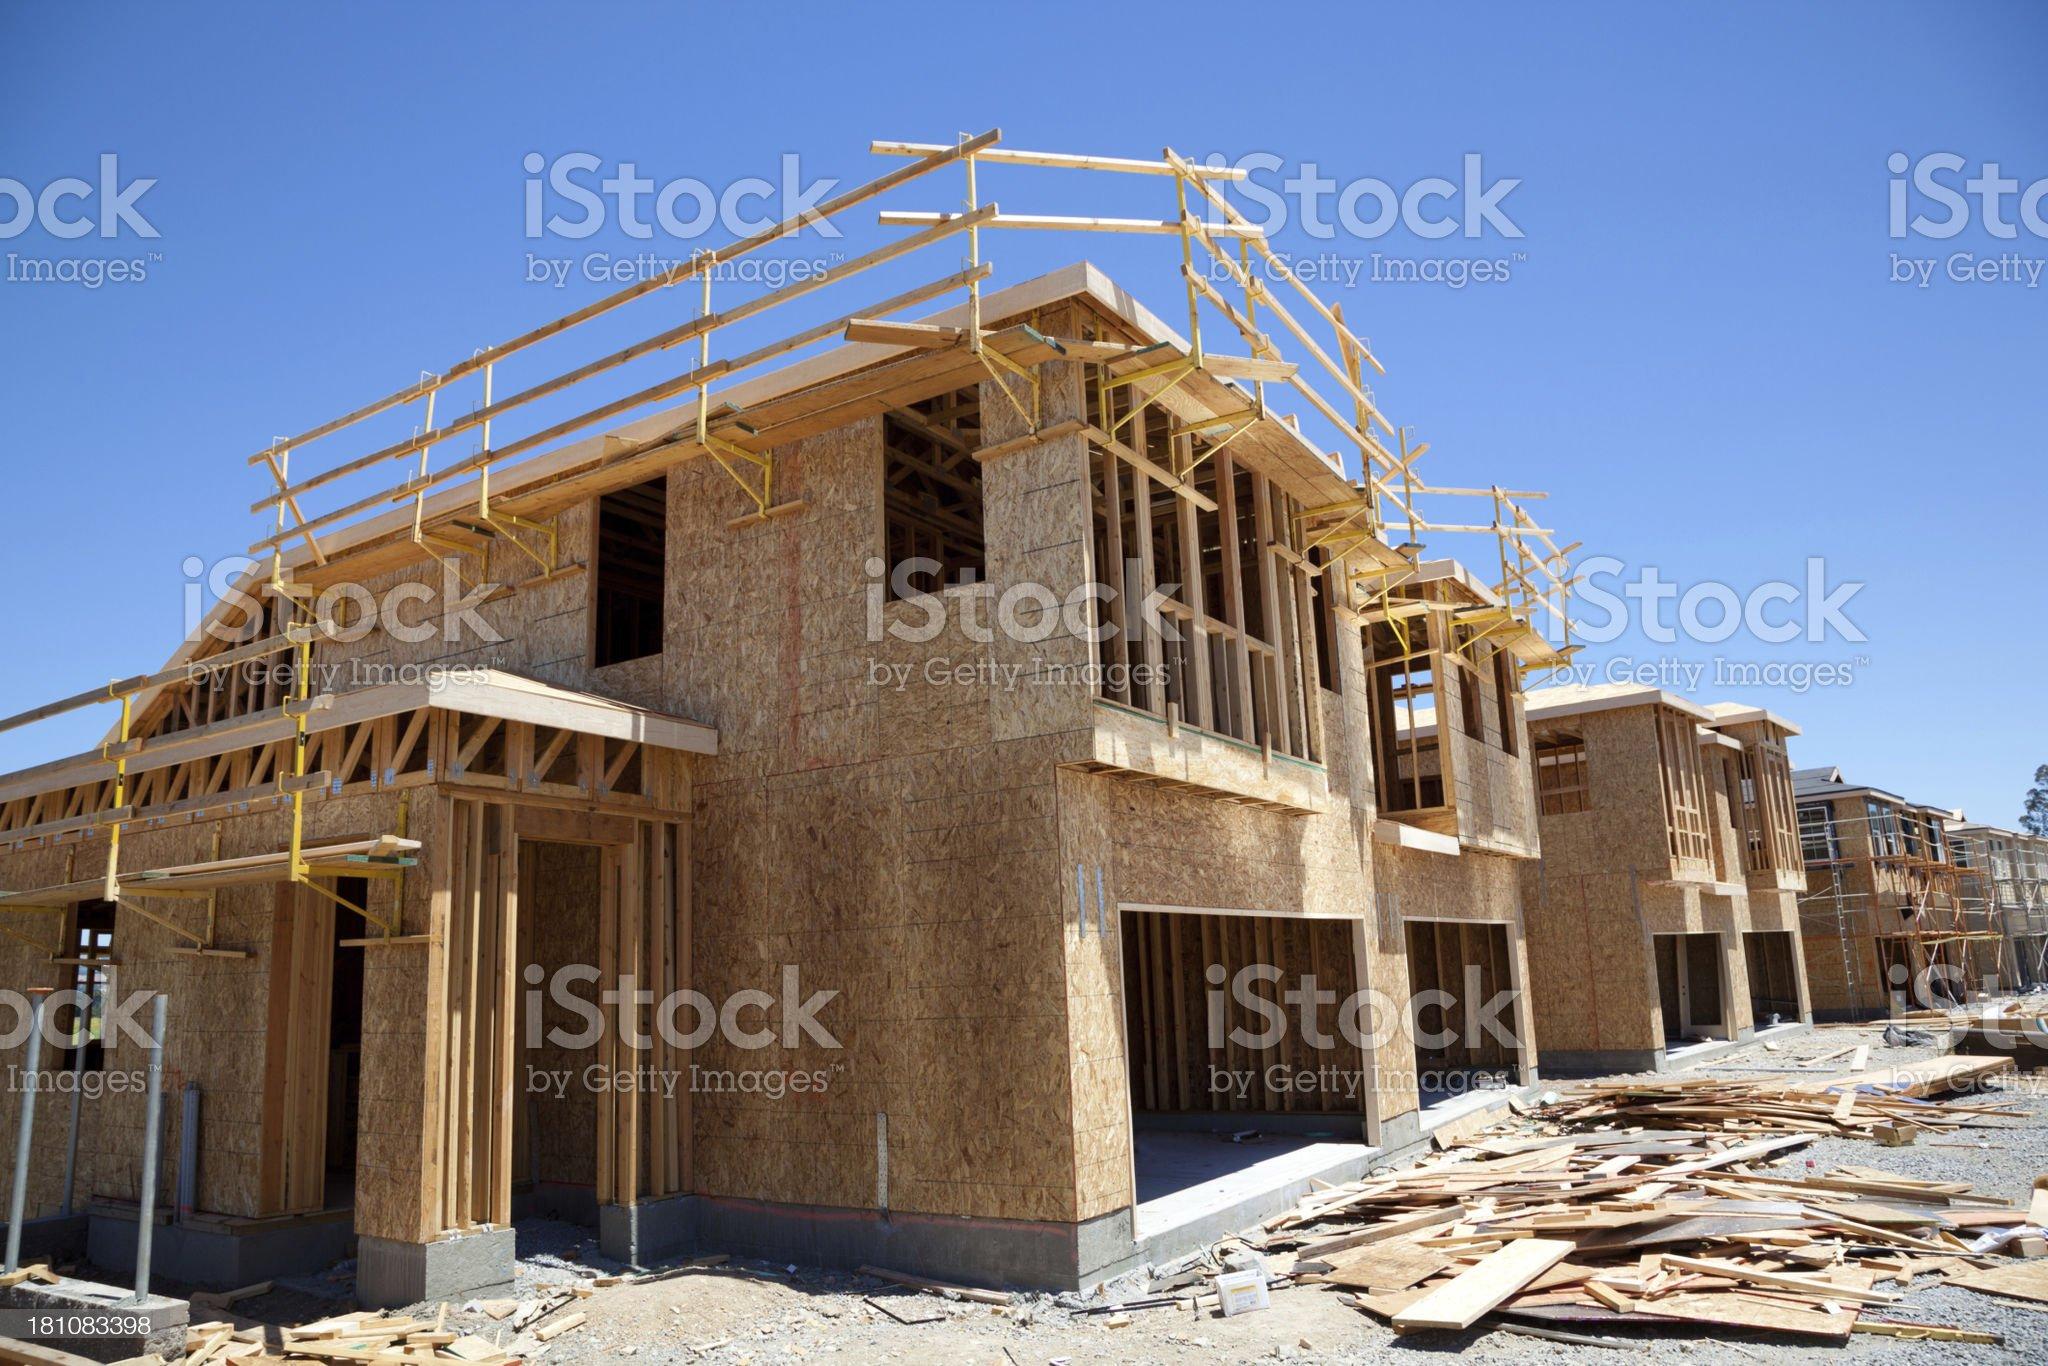 California Homes Under Construction royalty-free stock photo